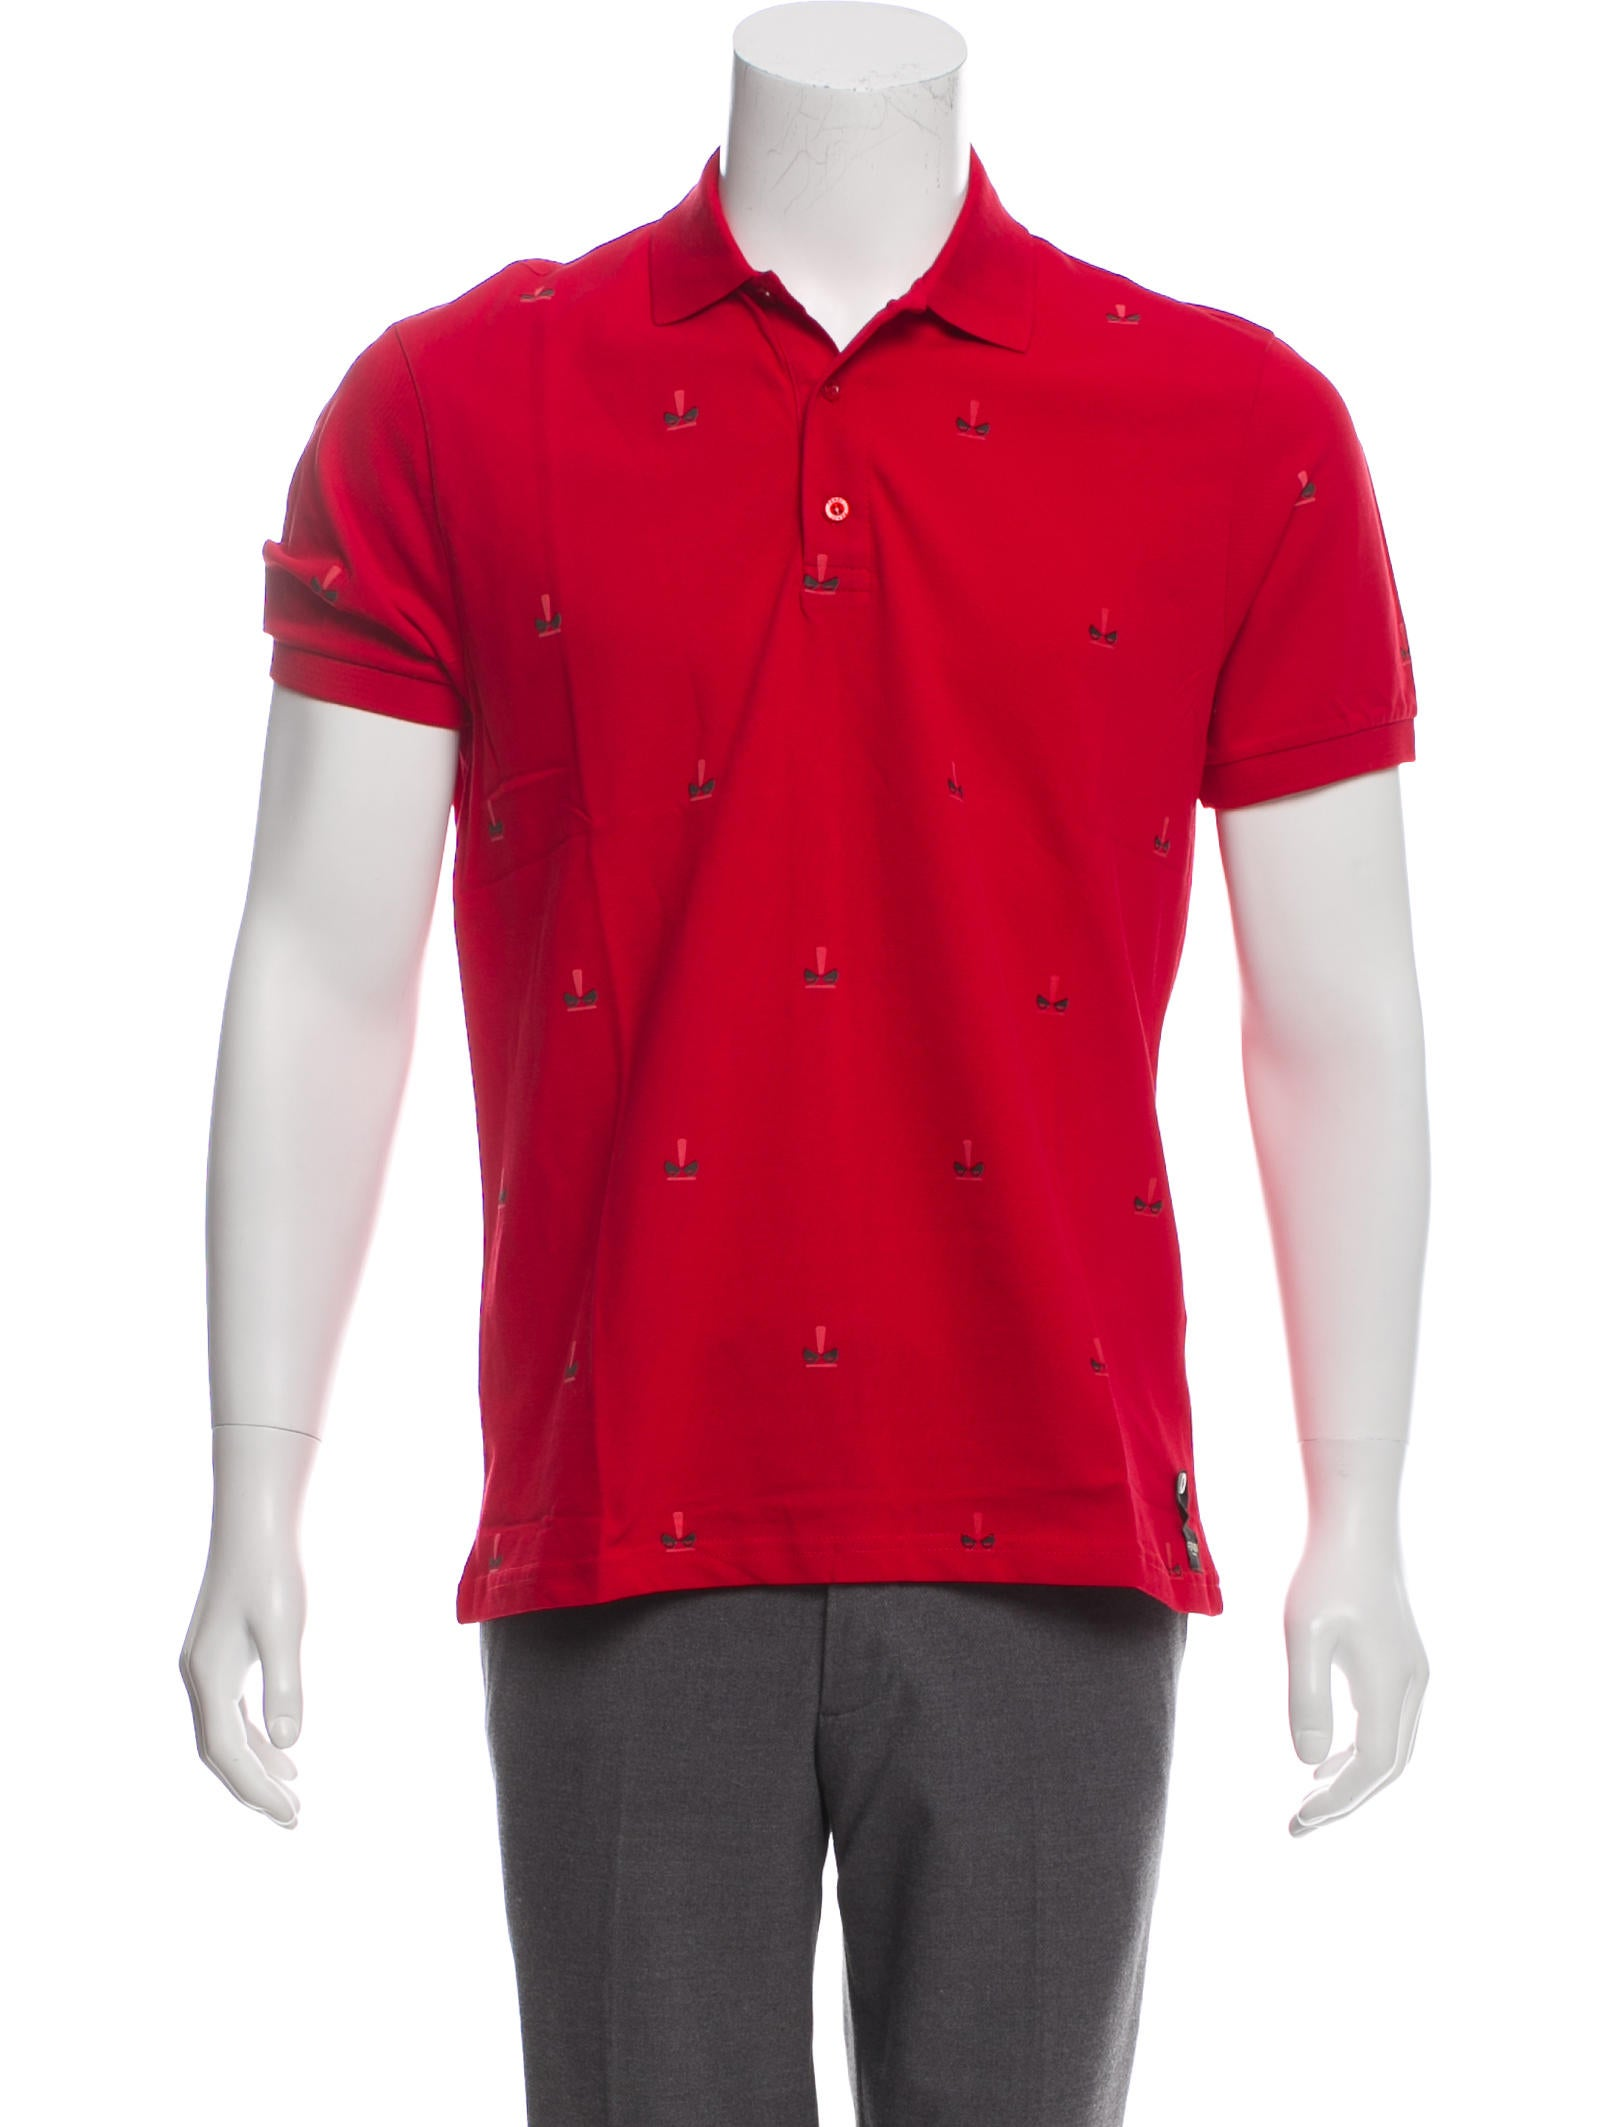 855454076 Fendi Short Sleeve Monster Eye Graphic Polo Shirt w/ Tags - Clothing ...